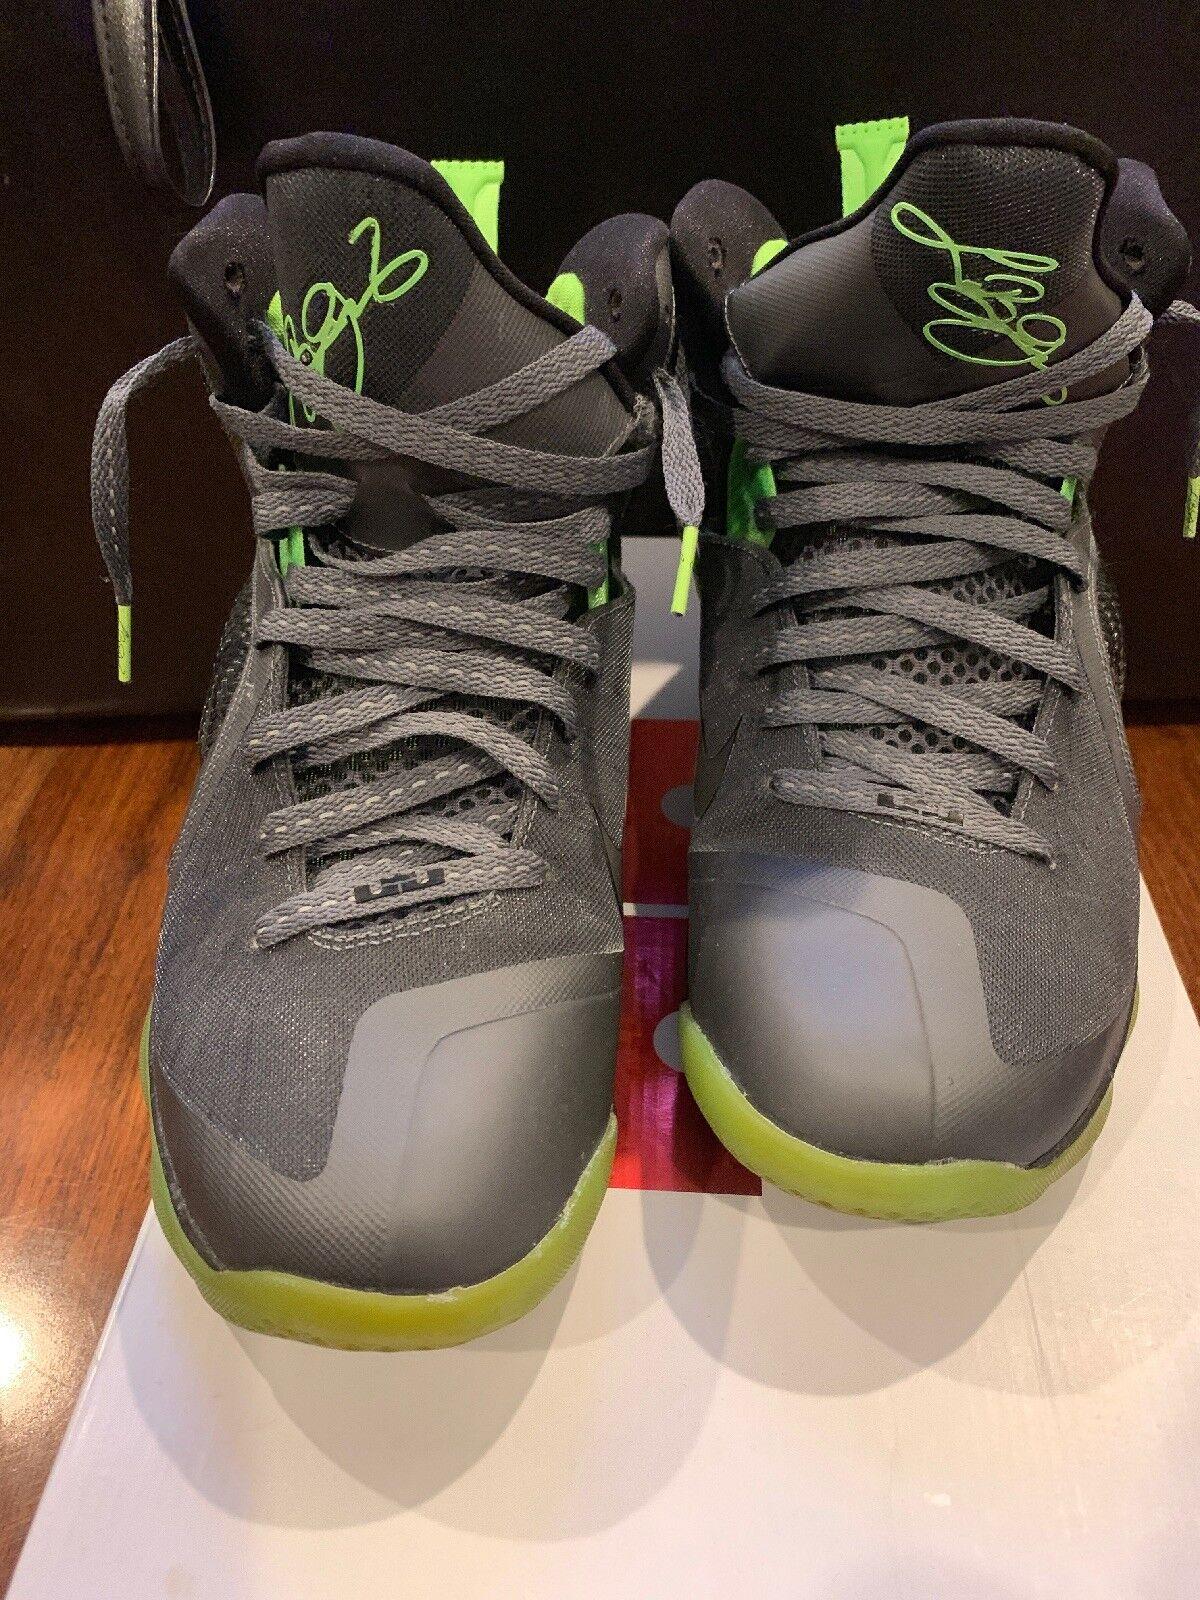 Nike Lebron 9 Dunk Man Size 11.5